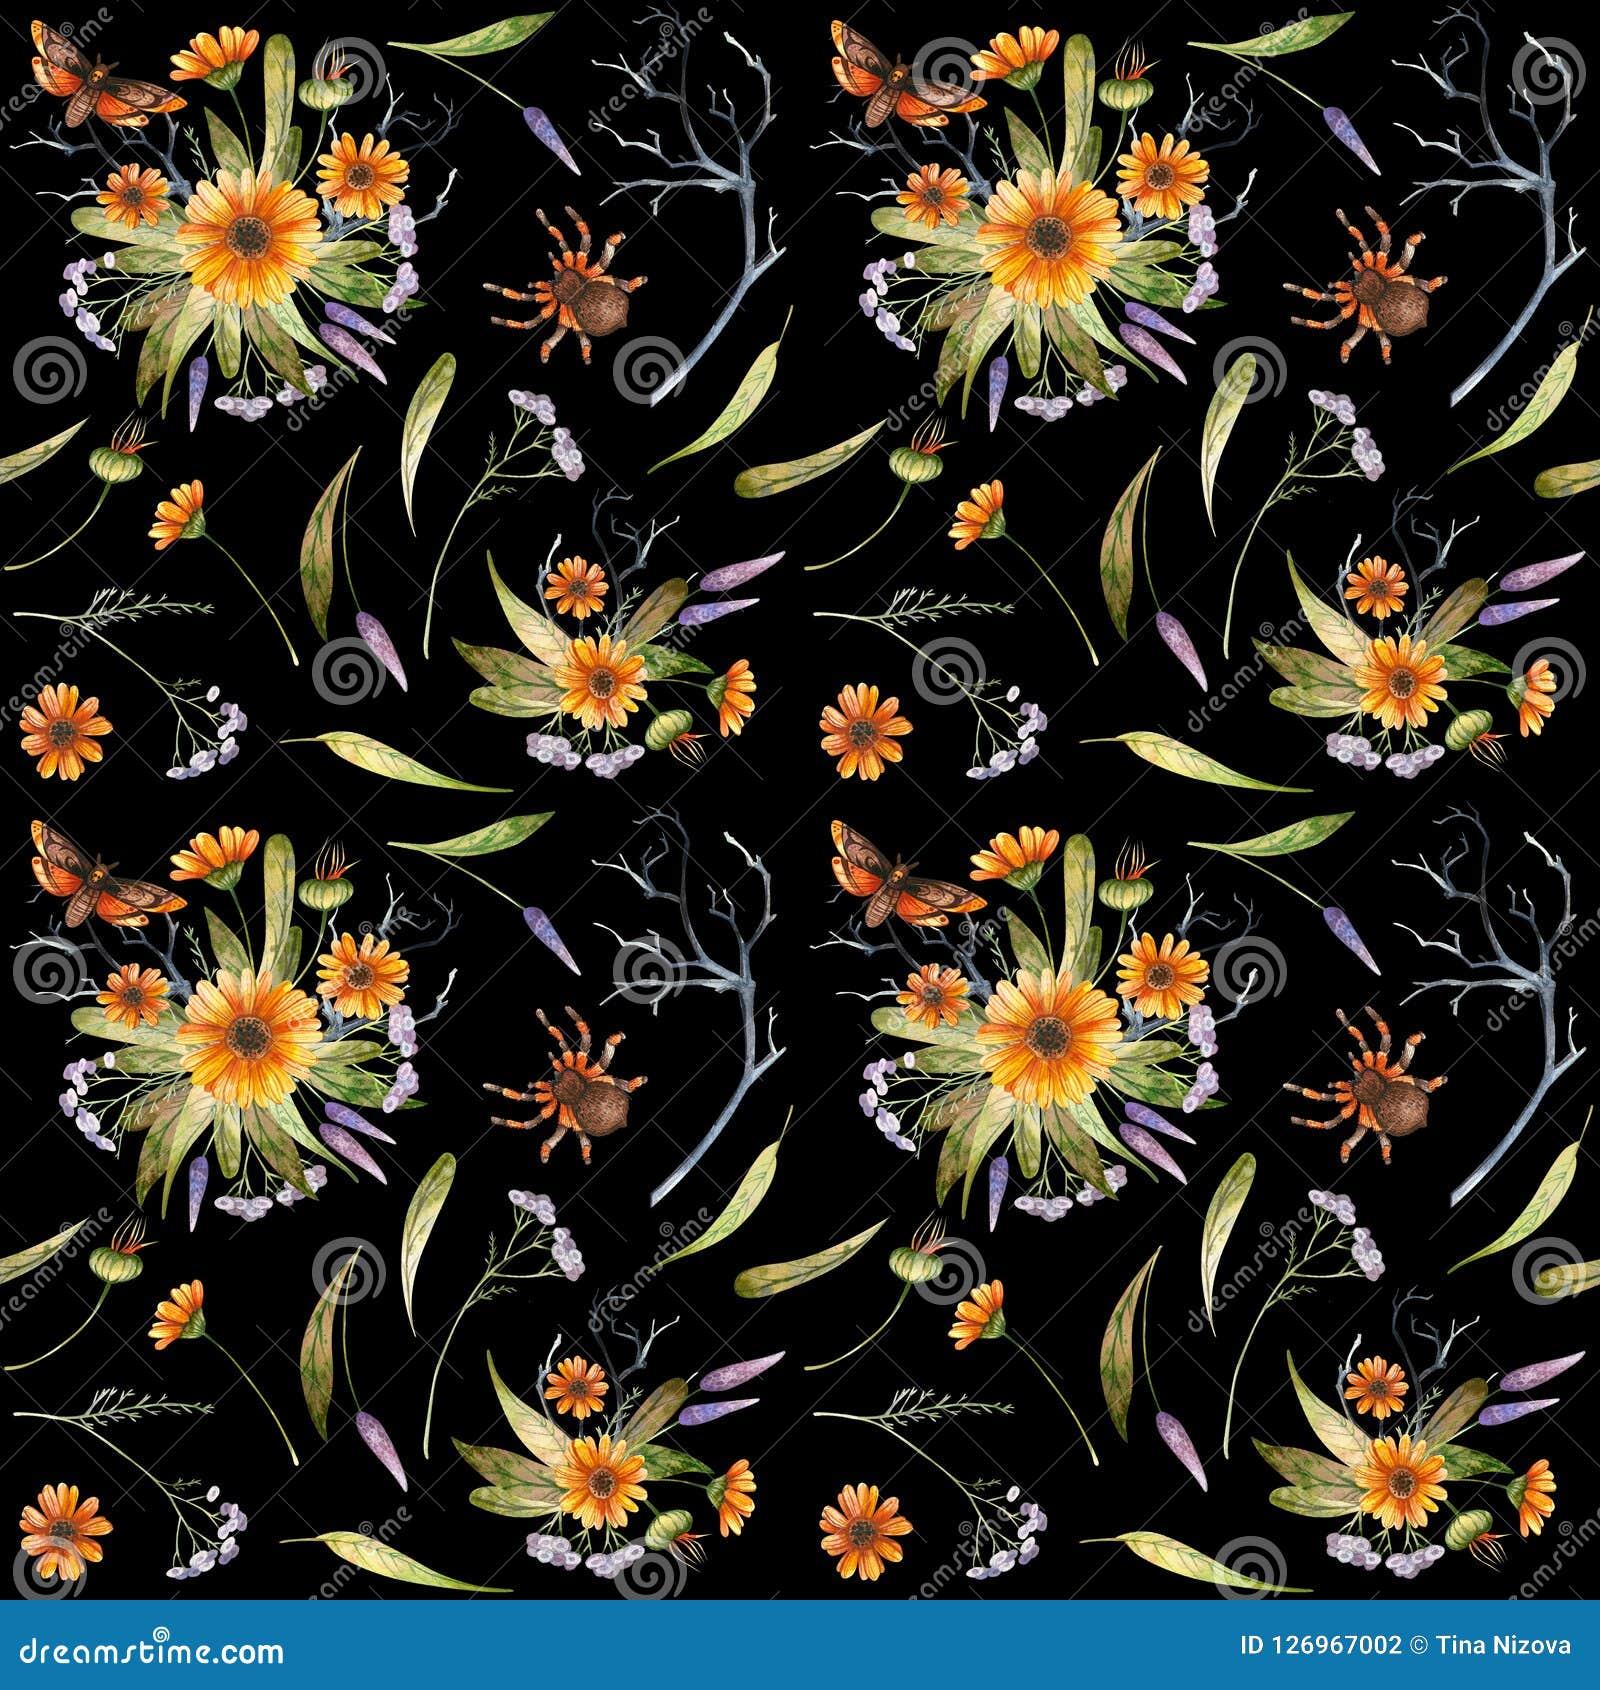 Watercolor Halloween pattern of flowers and butterflies